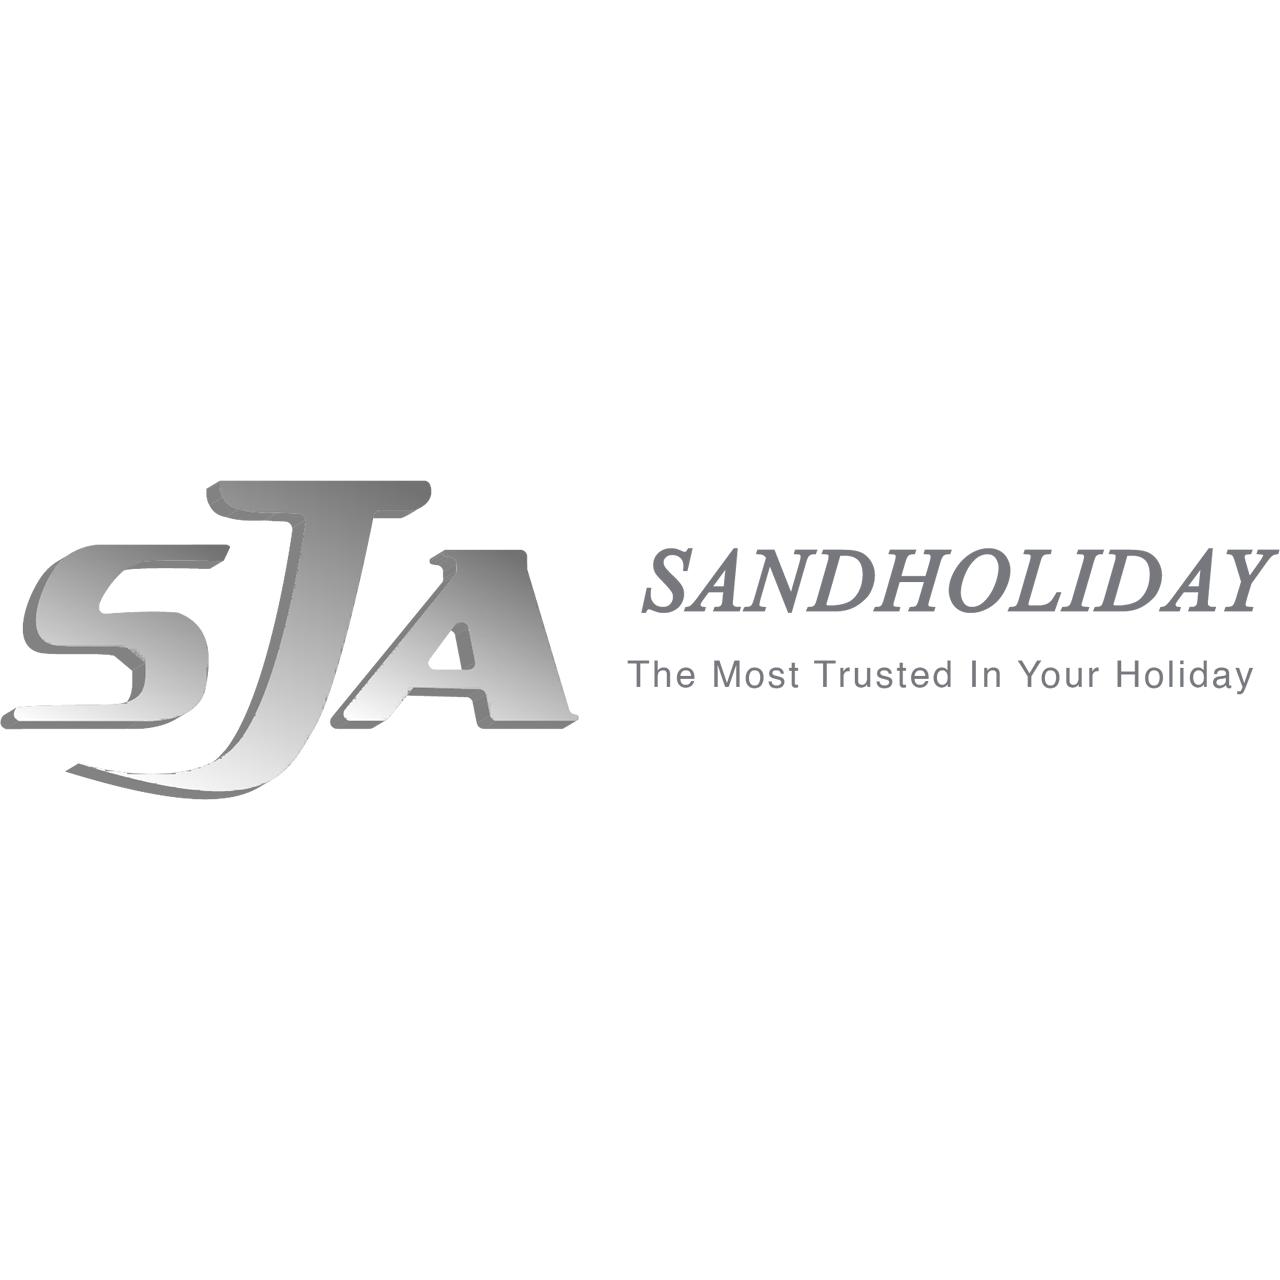 Sandholiday image